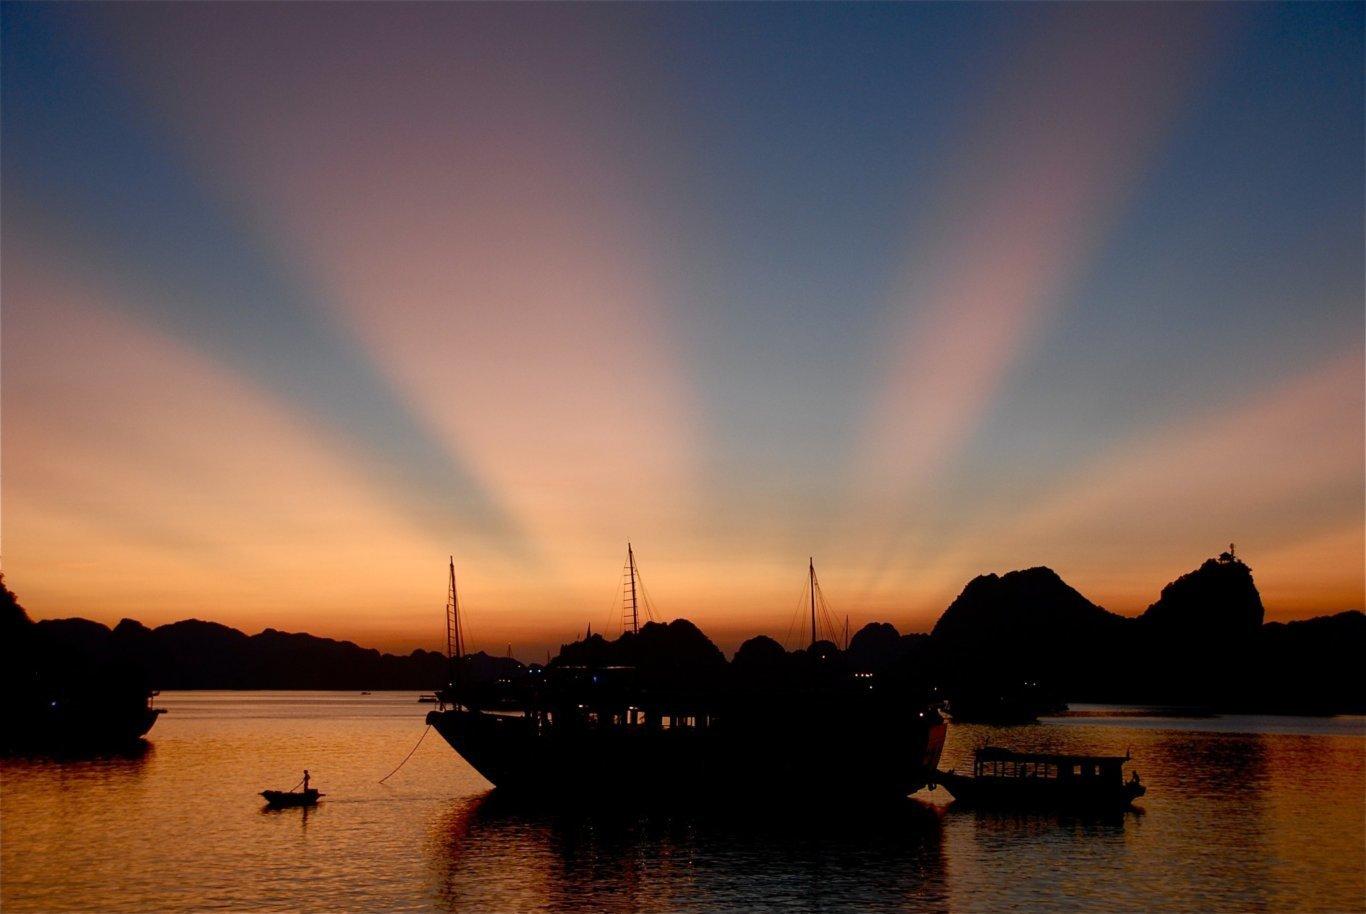 6-Day Northern Vietnam Experience - Vietnam Itinerary